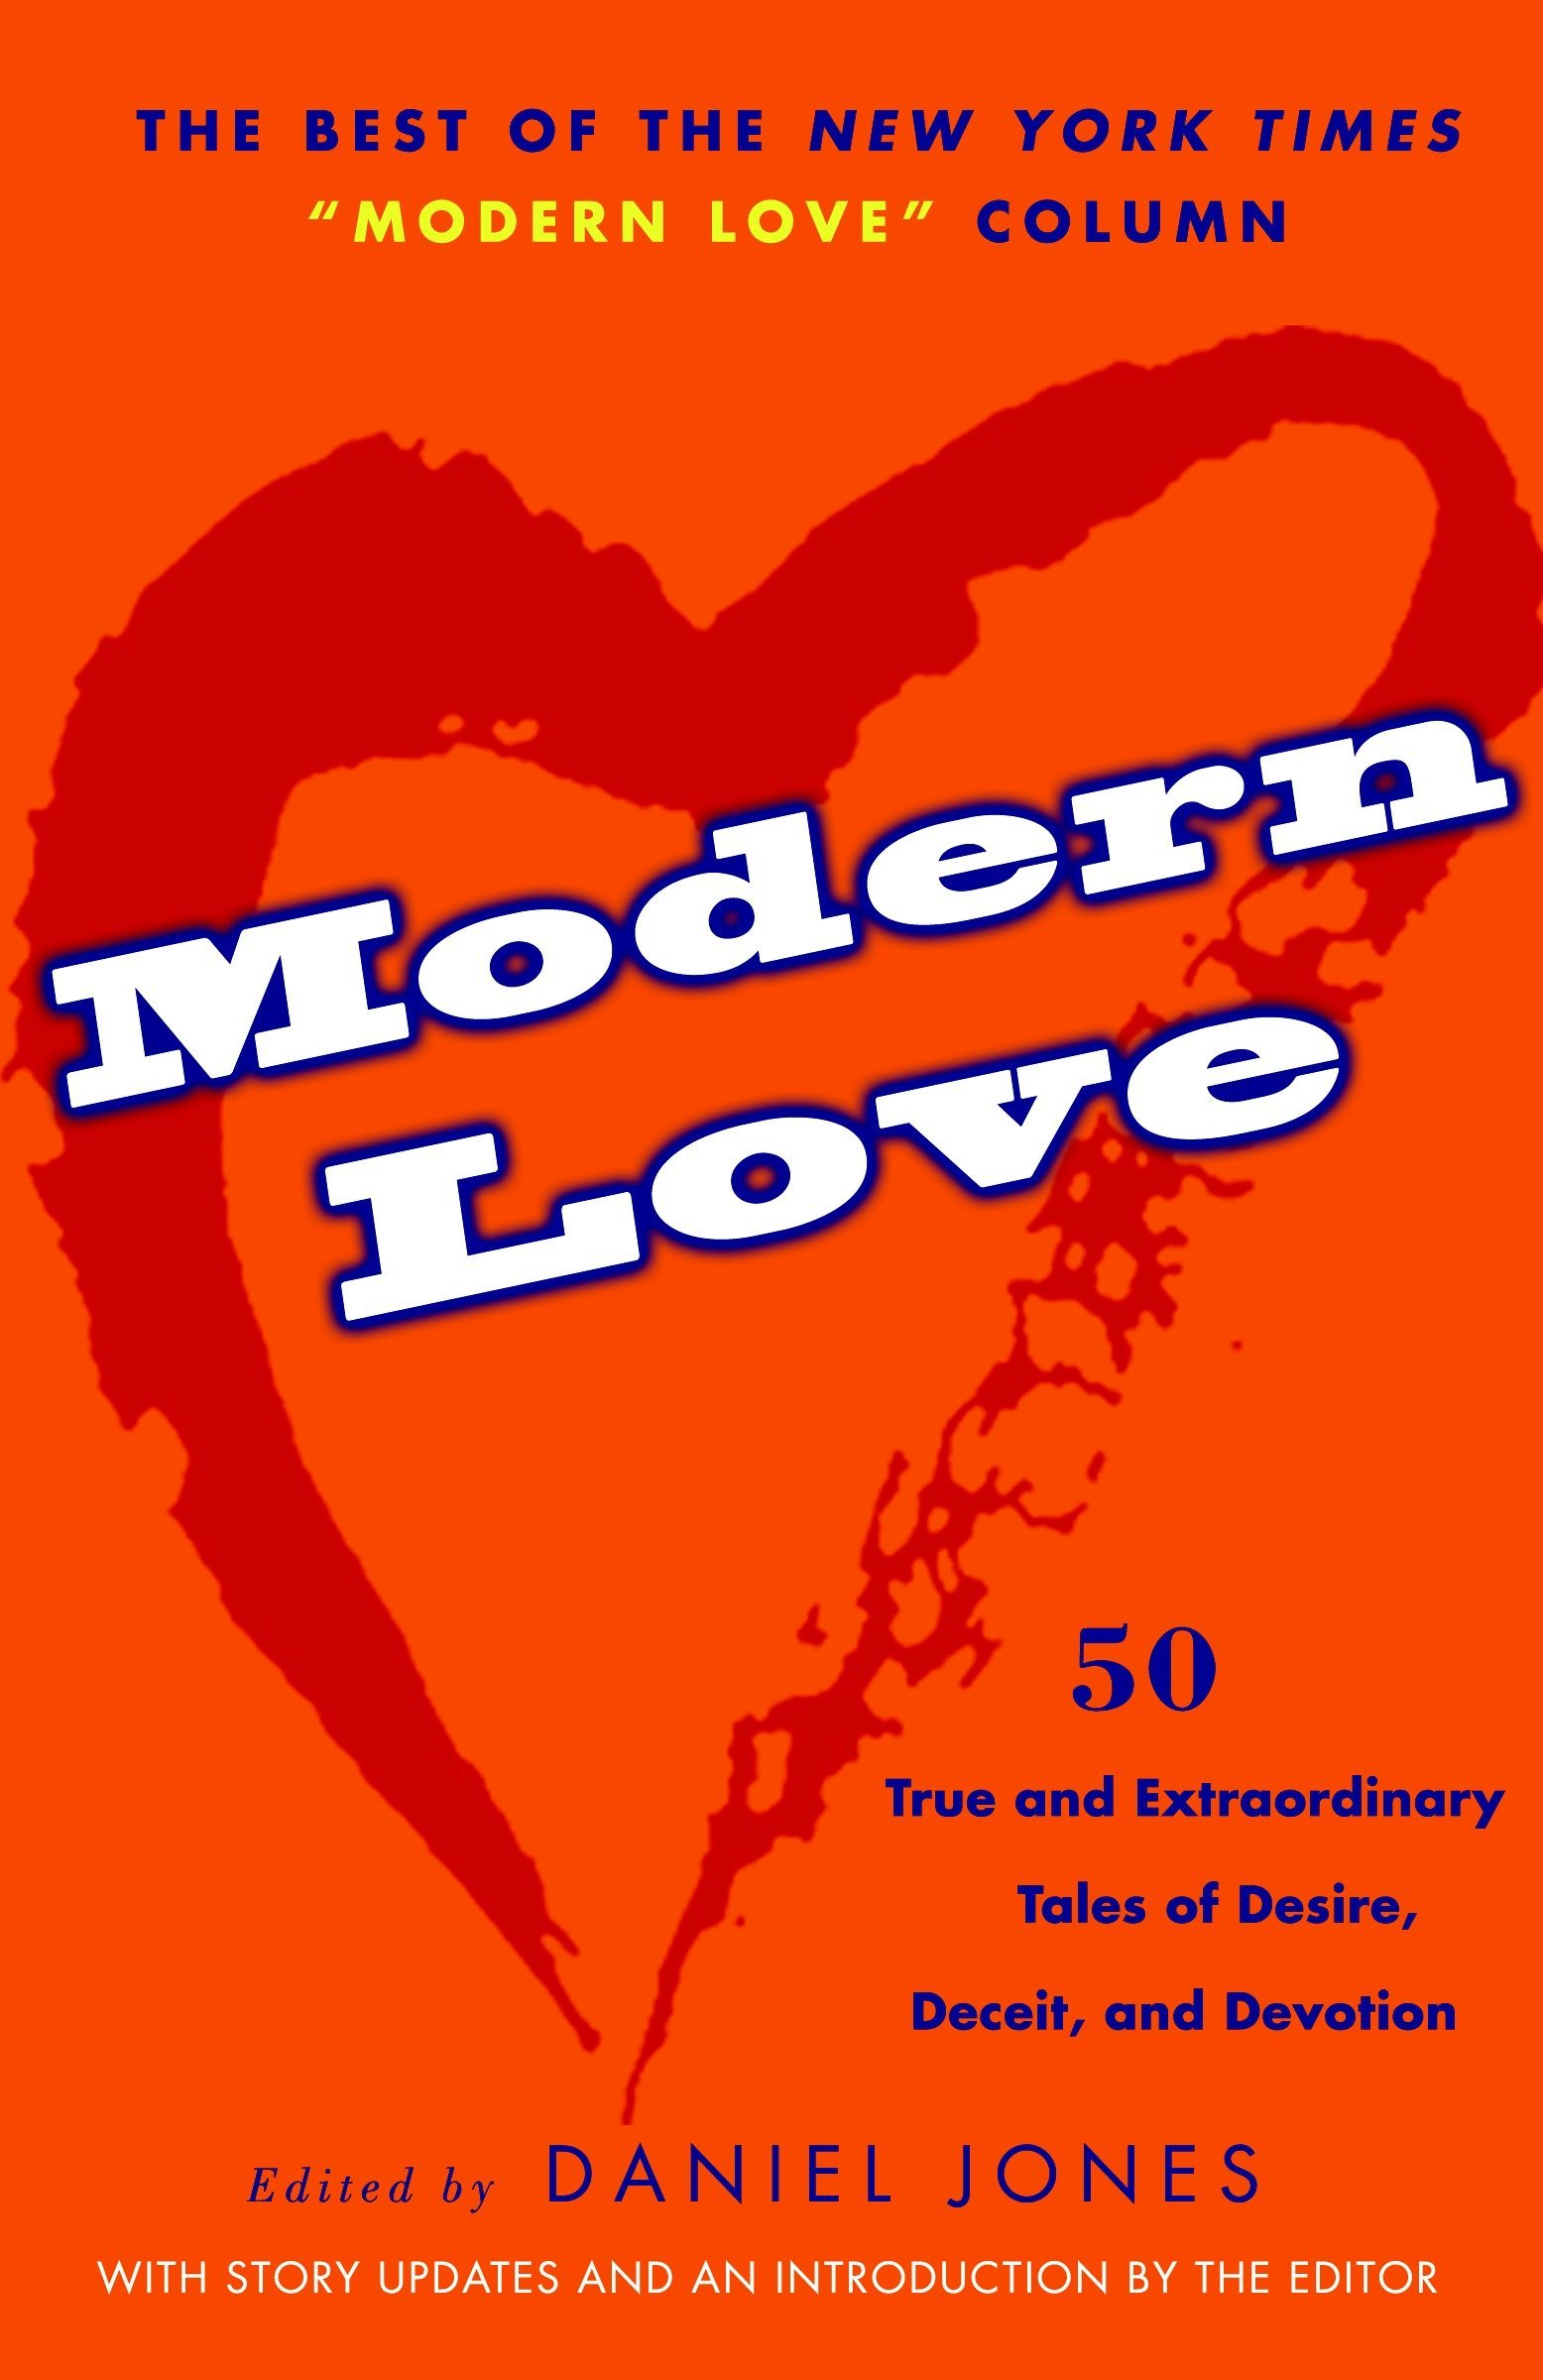 www nytimes com modern love